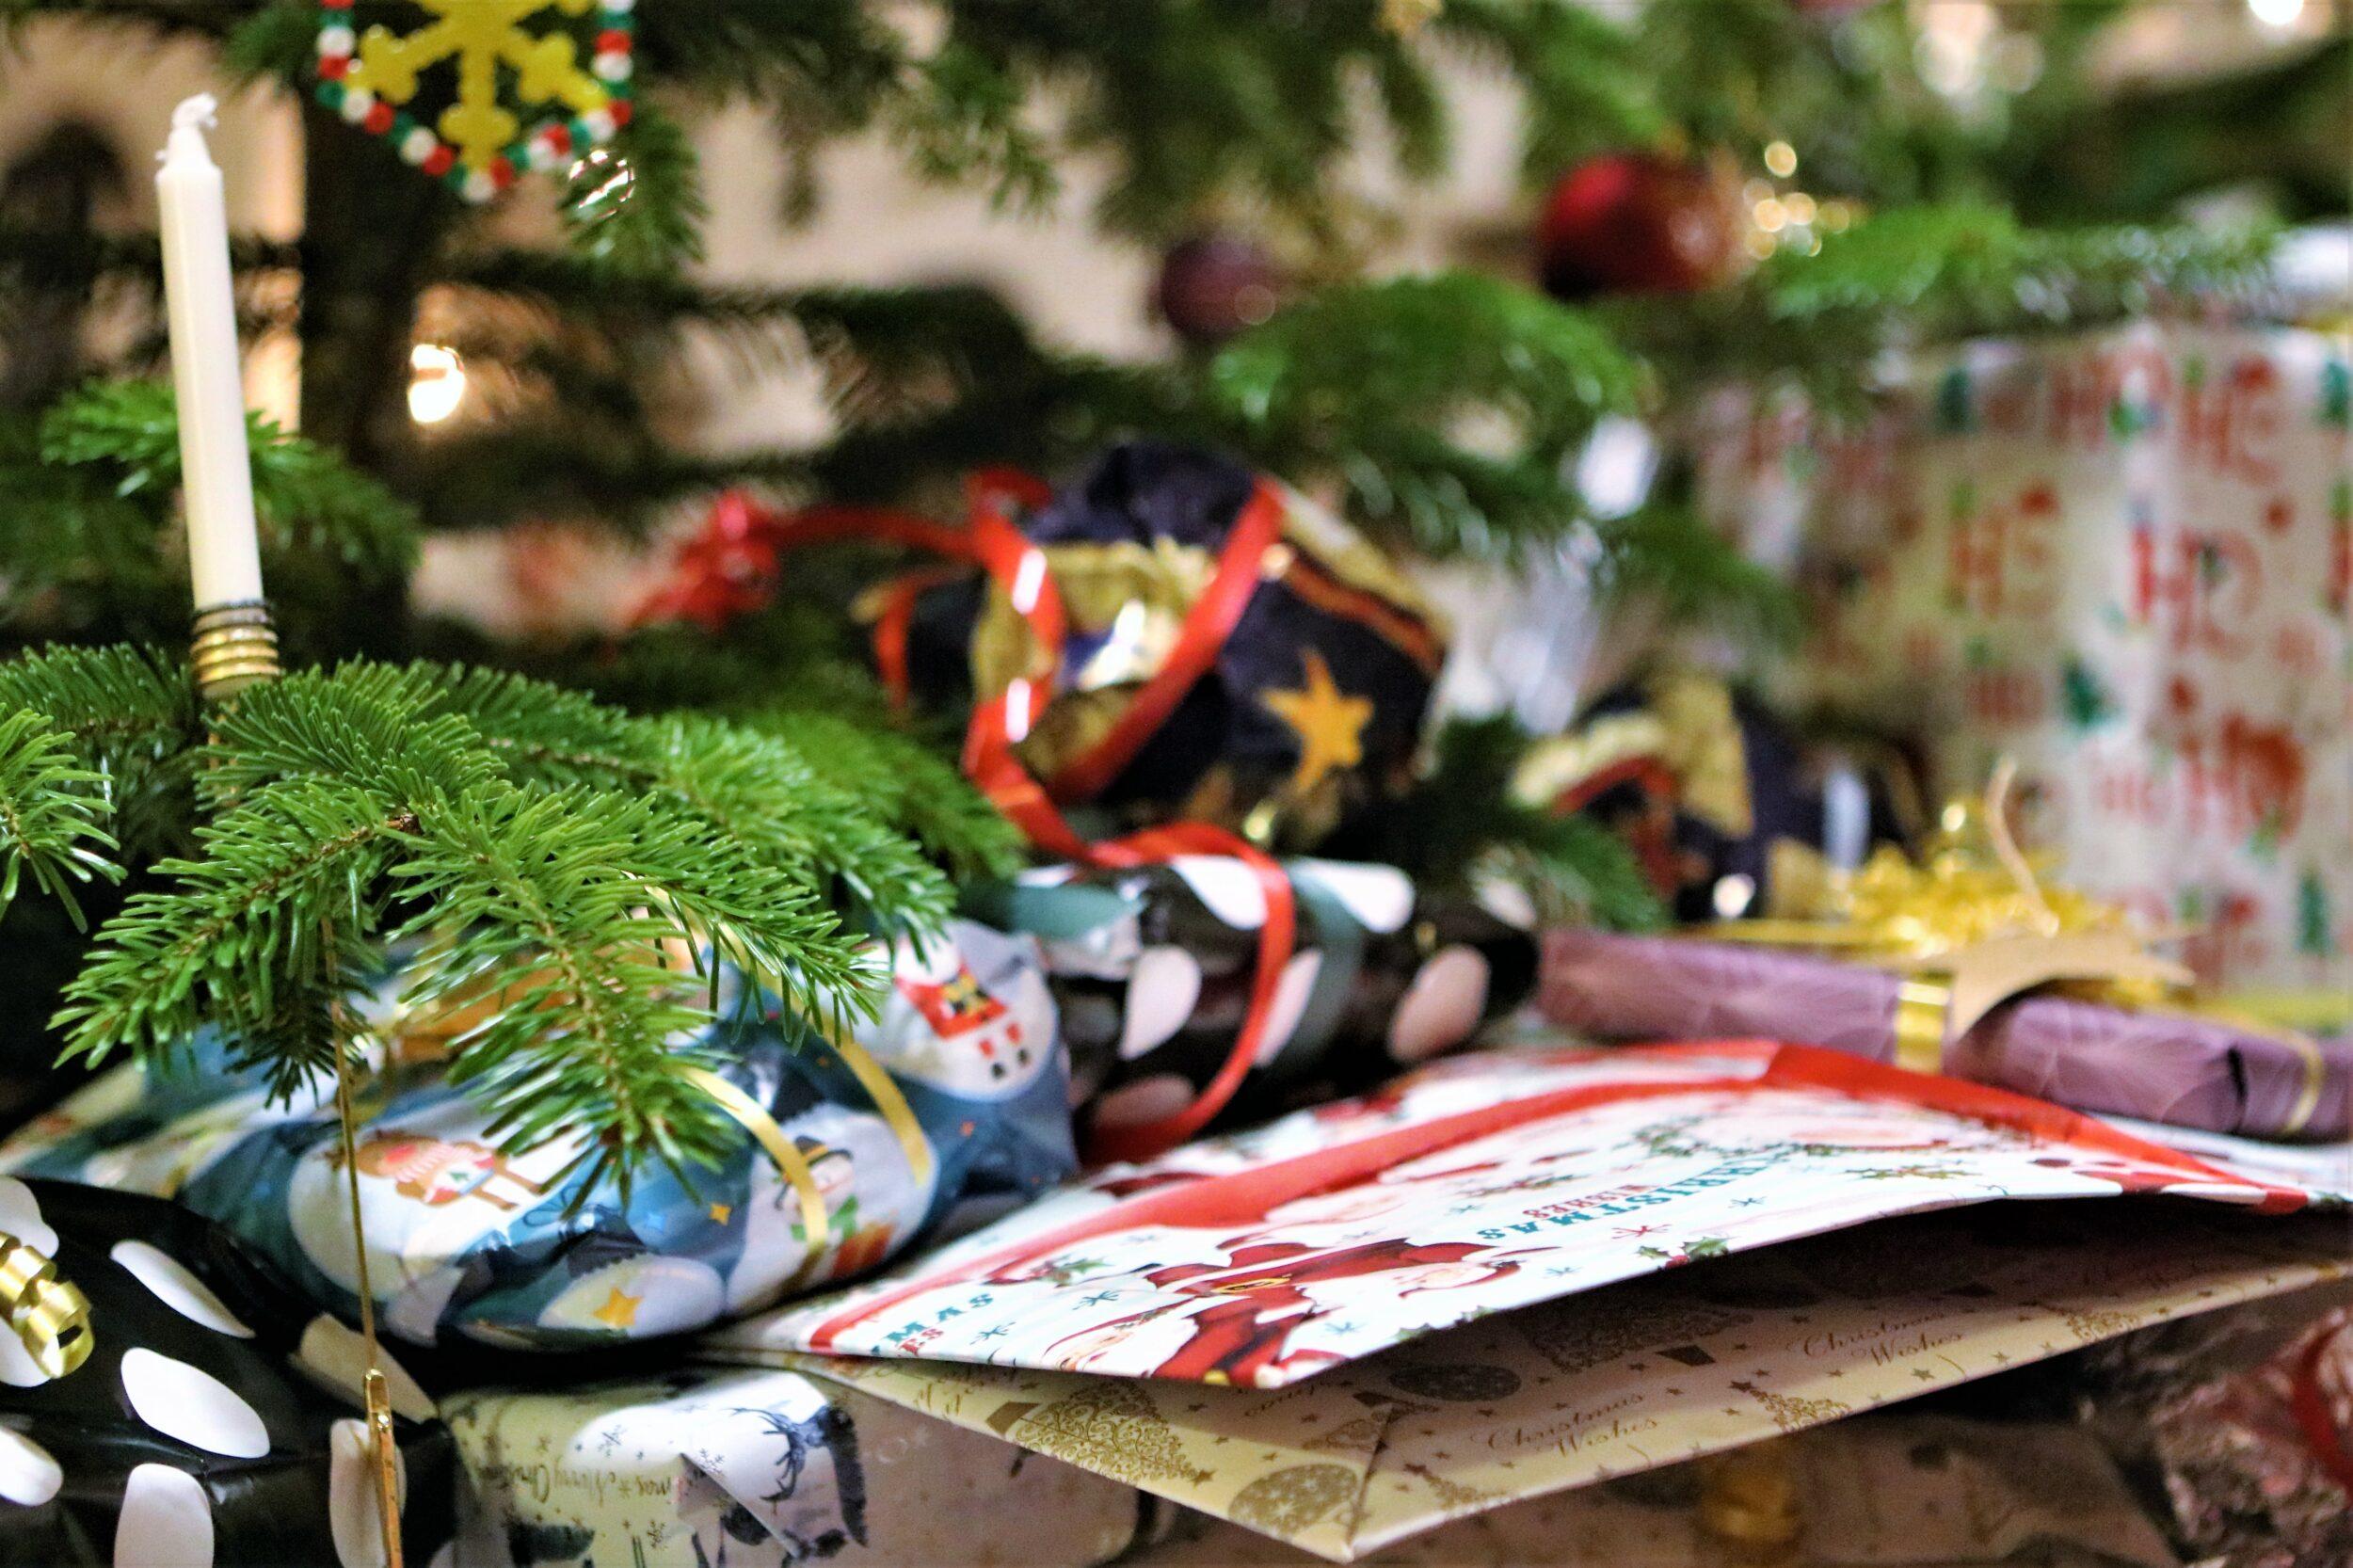 Giv den perfekte gave, giv et Holbæk gavekort